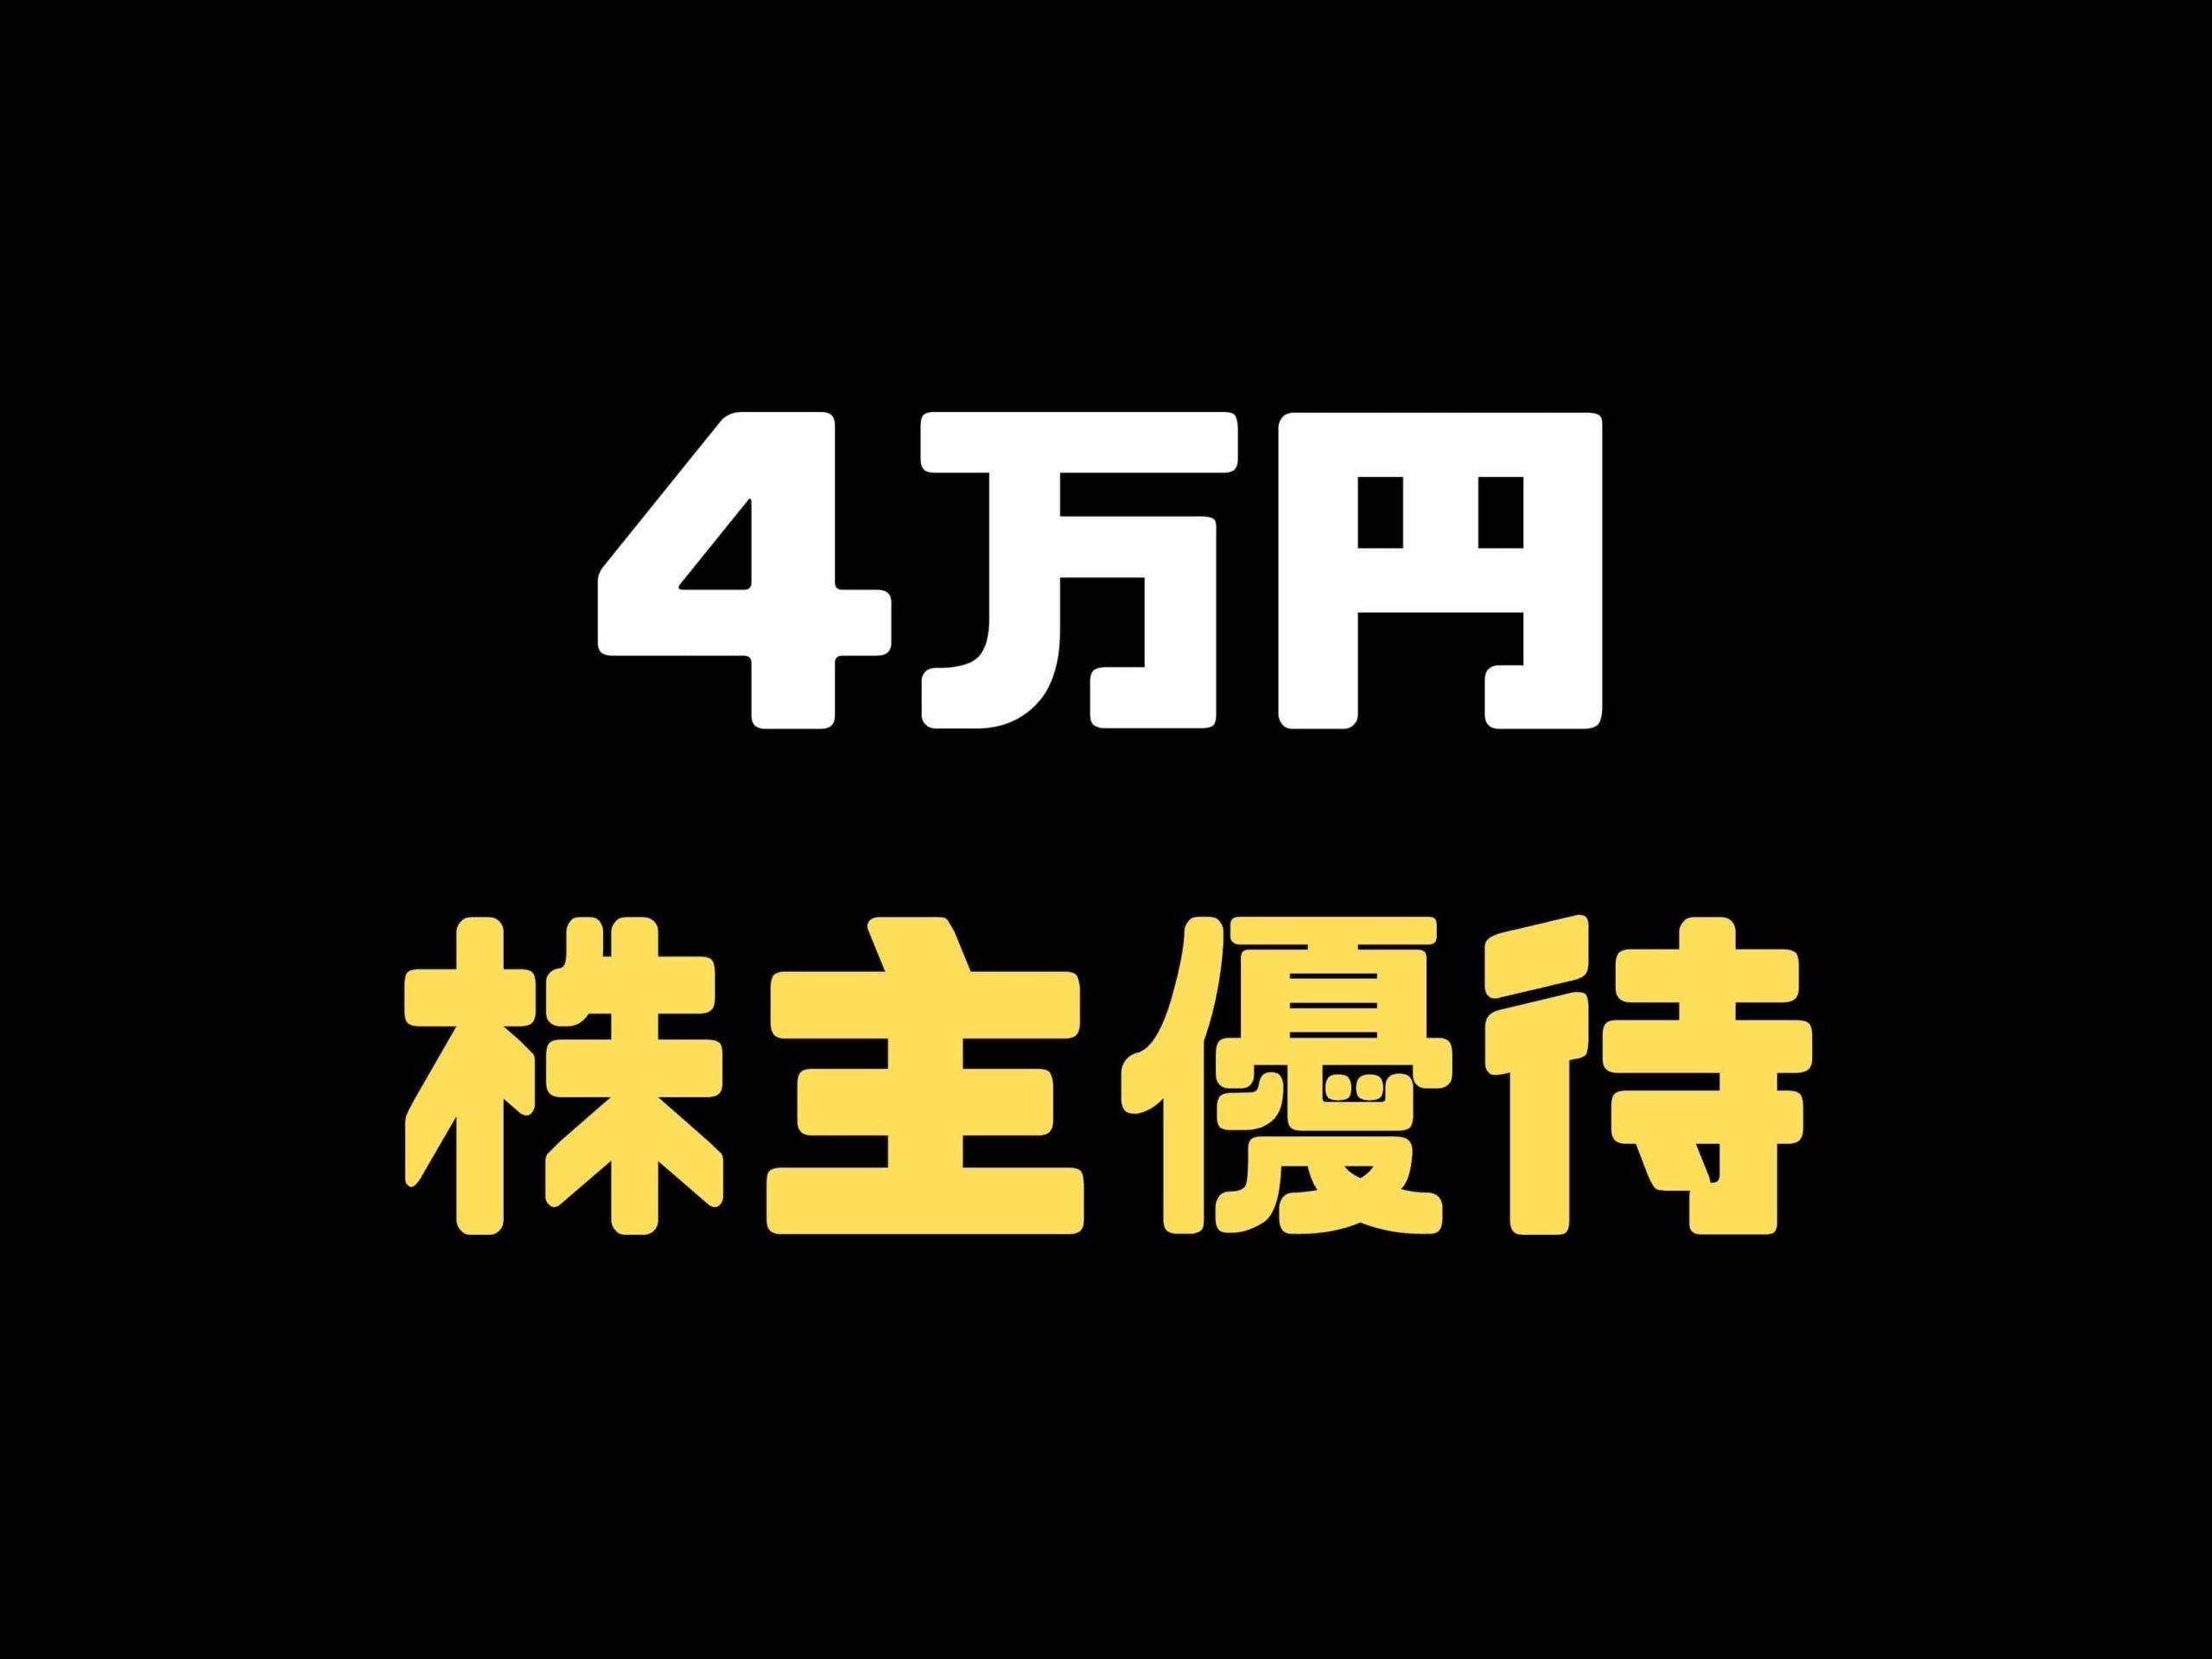 【2021年版】4万円以下で購入出来る株主優待